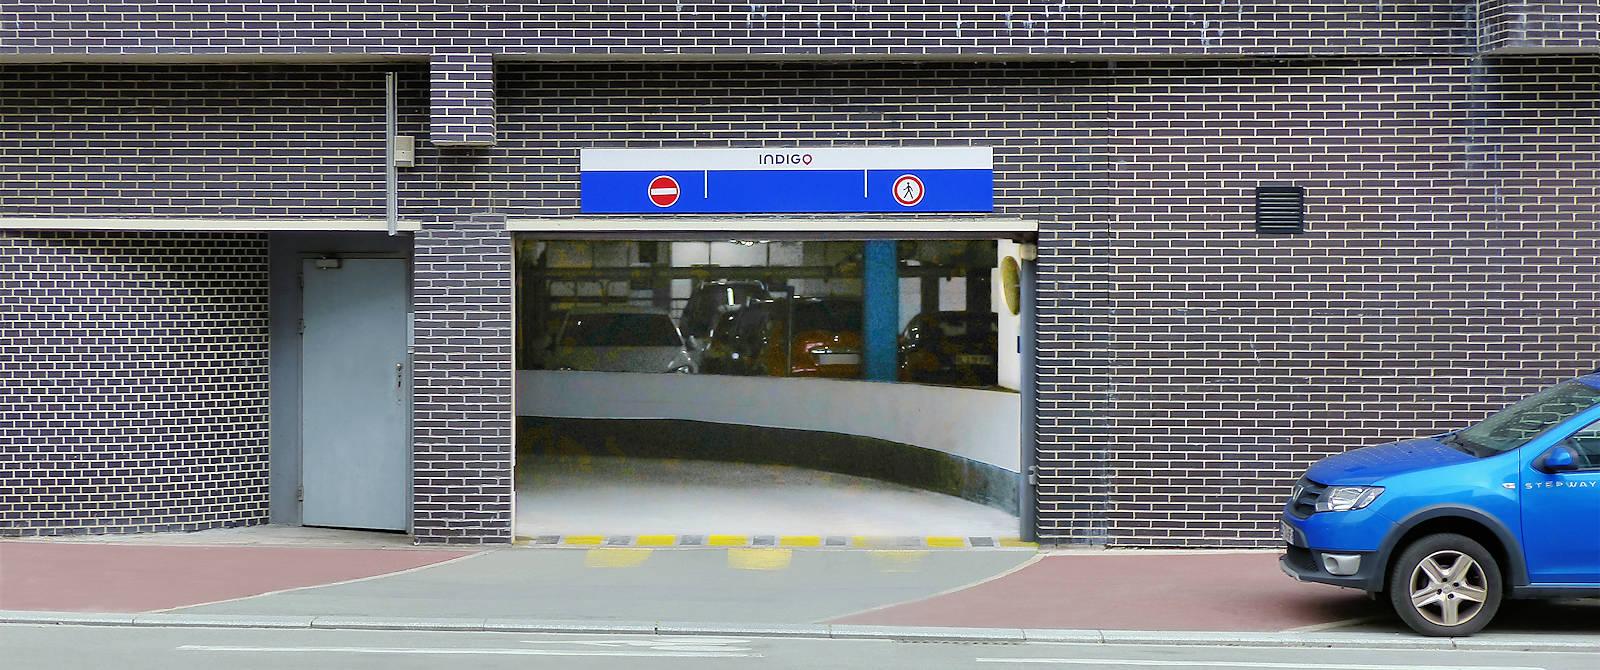 Parking Indigo Cavell, Tourcoing